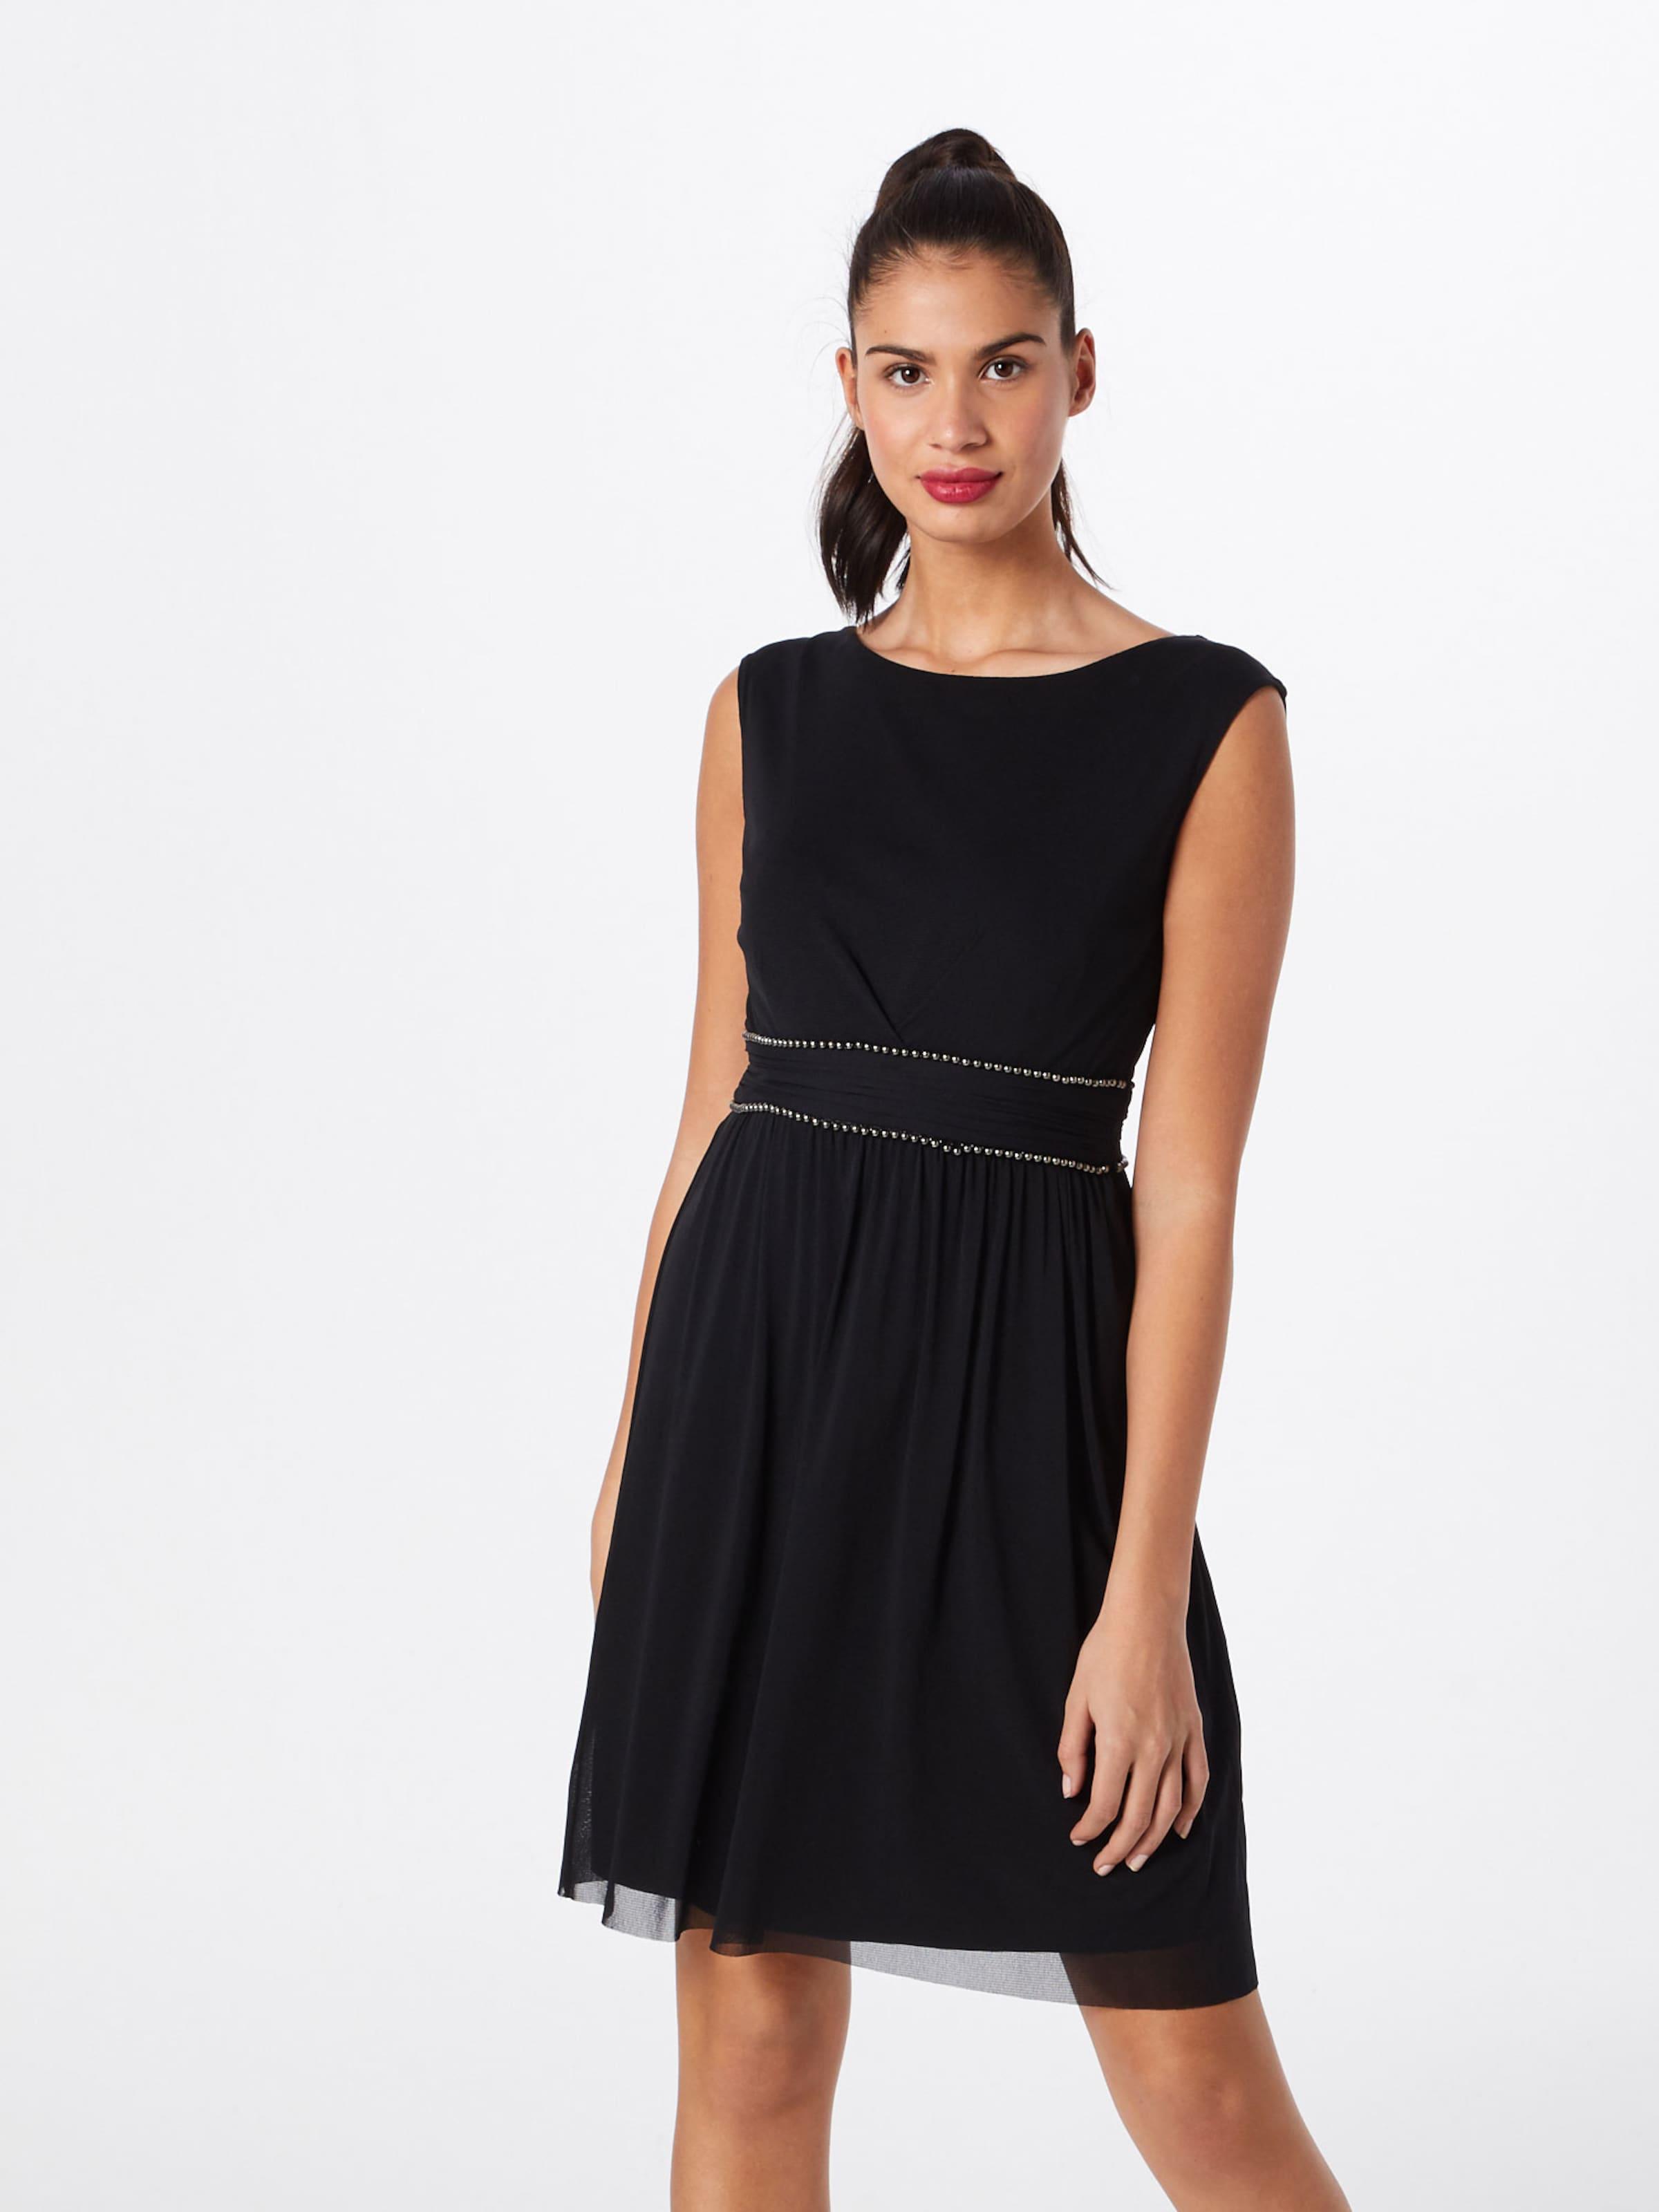 En Robe En Robe Esprit Esprit Collection Noir Collection 5j43ARL